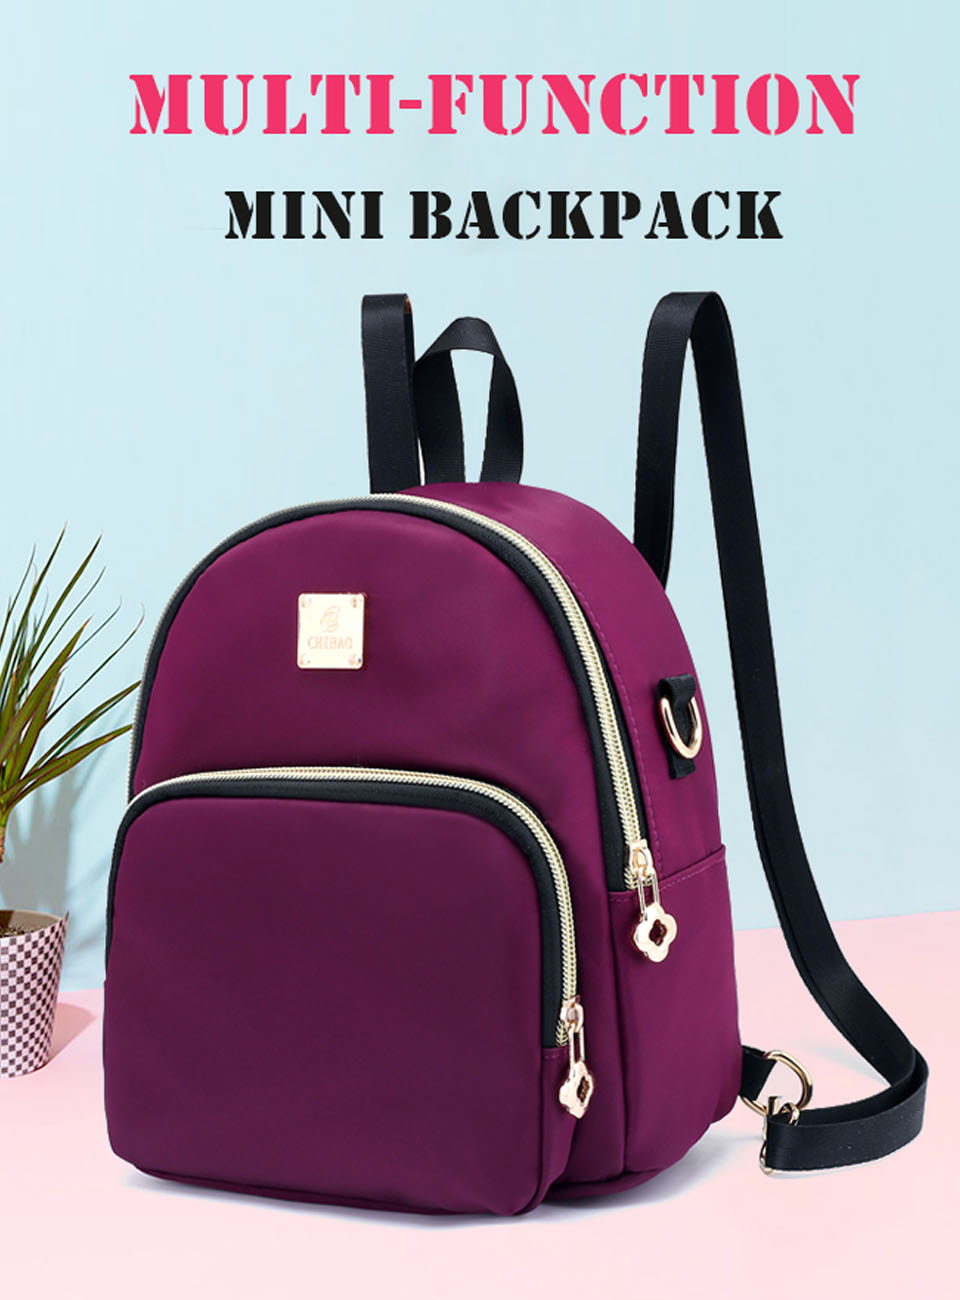 962de7ec71c7 Women Mini Backpack Purse Nylon Waterproof Small Backpack for Girls  Multifunctional Cross Body Bag 2018 Fashion Bag #199150